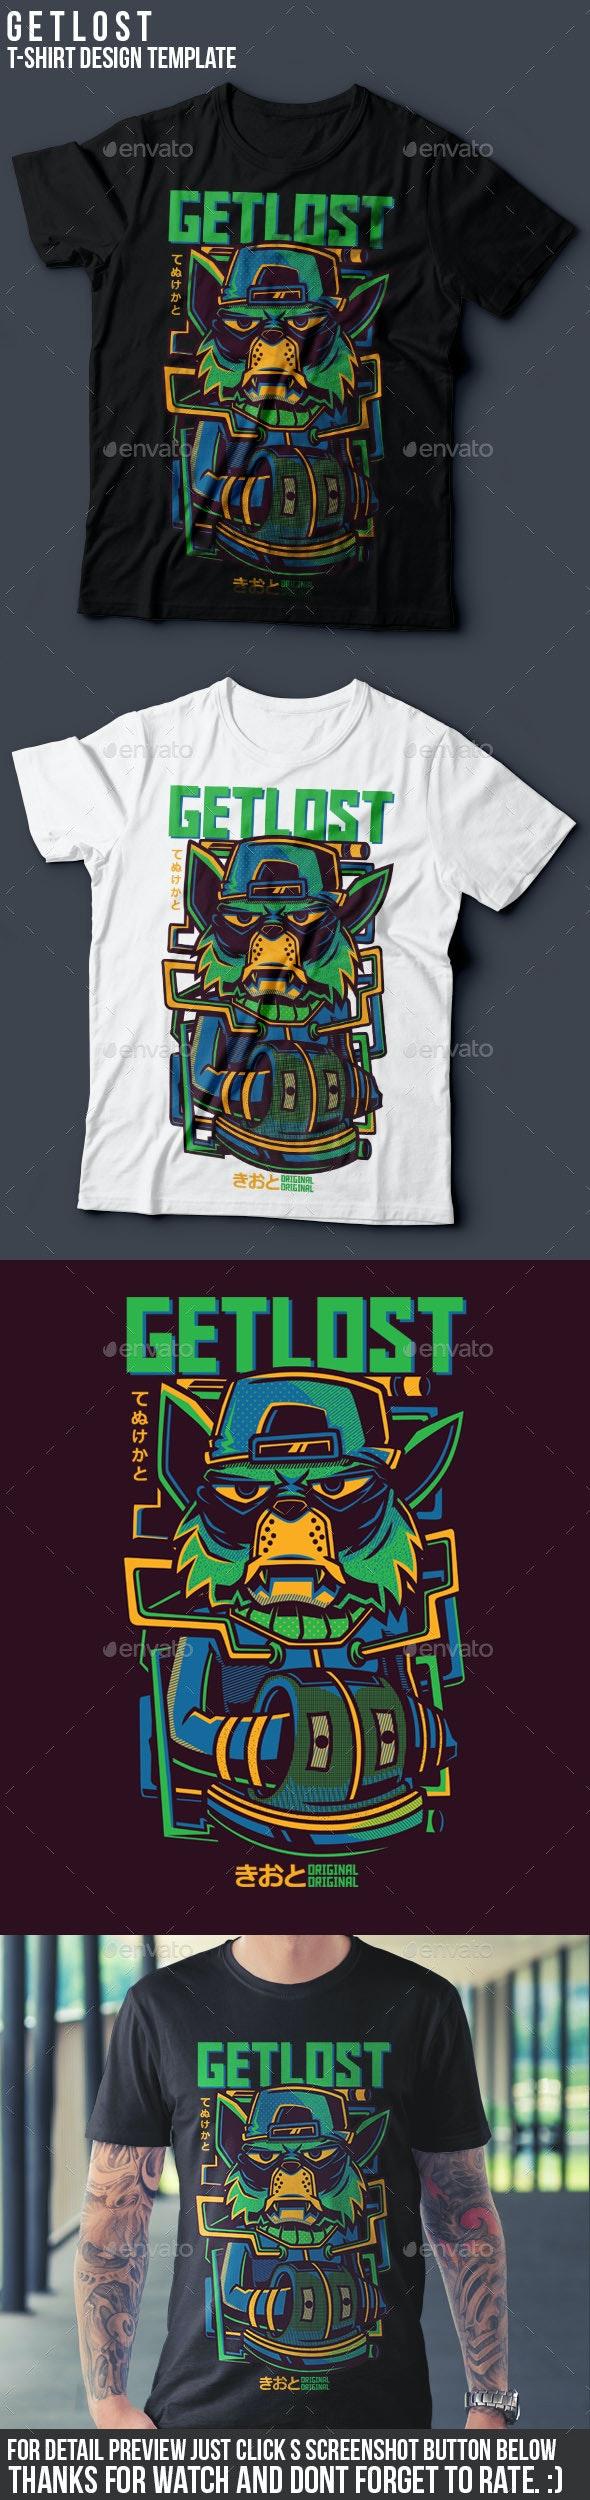 Get Lost T-Shirt Design - Funny Designs